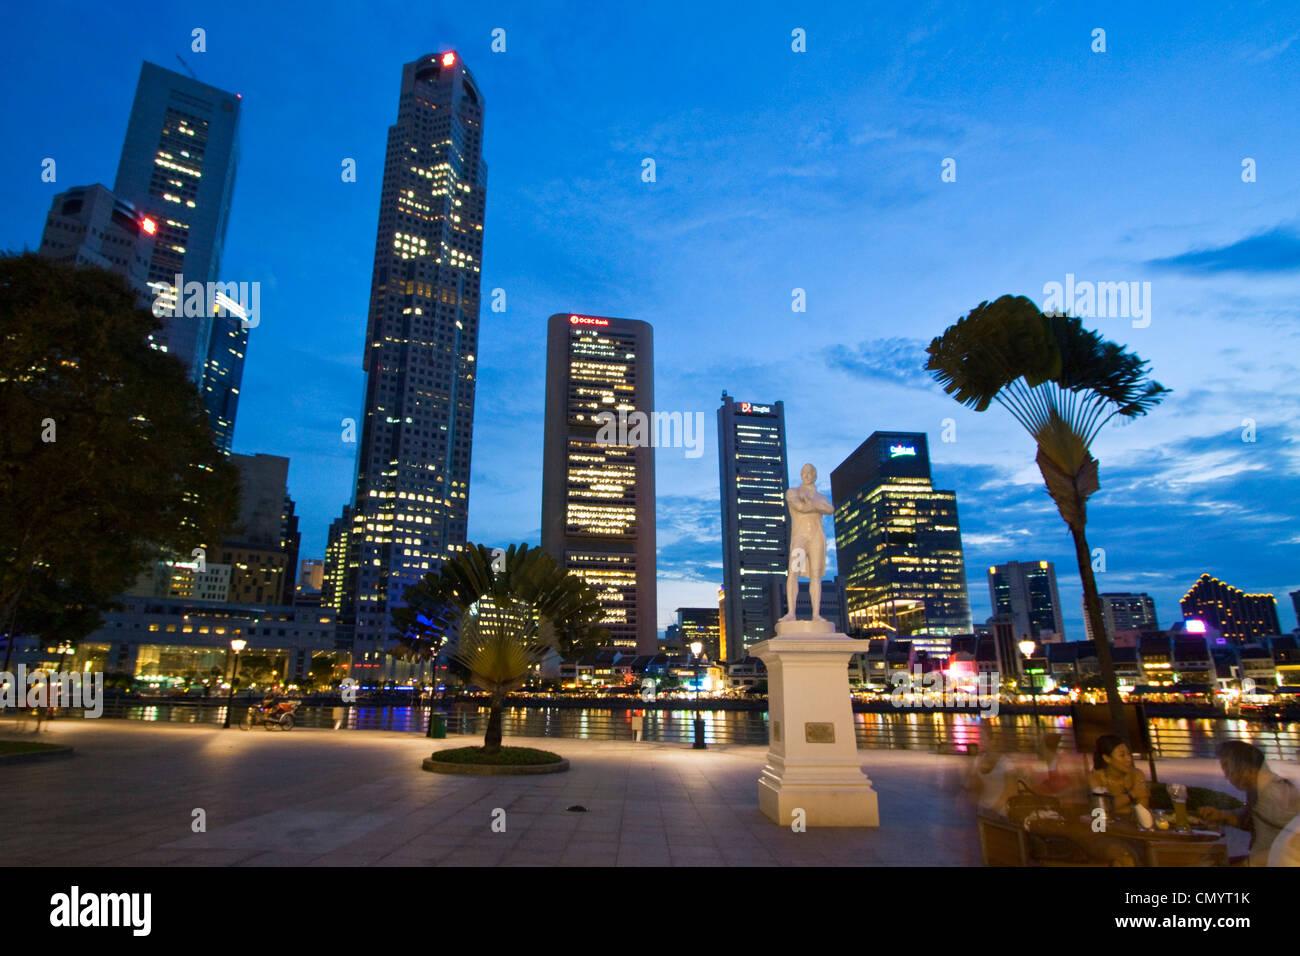 Skyline von Singapur, Raffles Statue, Süd-Ost-Asien, twilight Stockbild